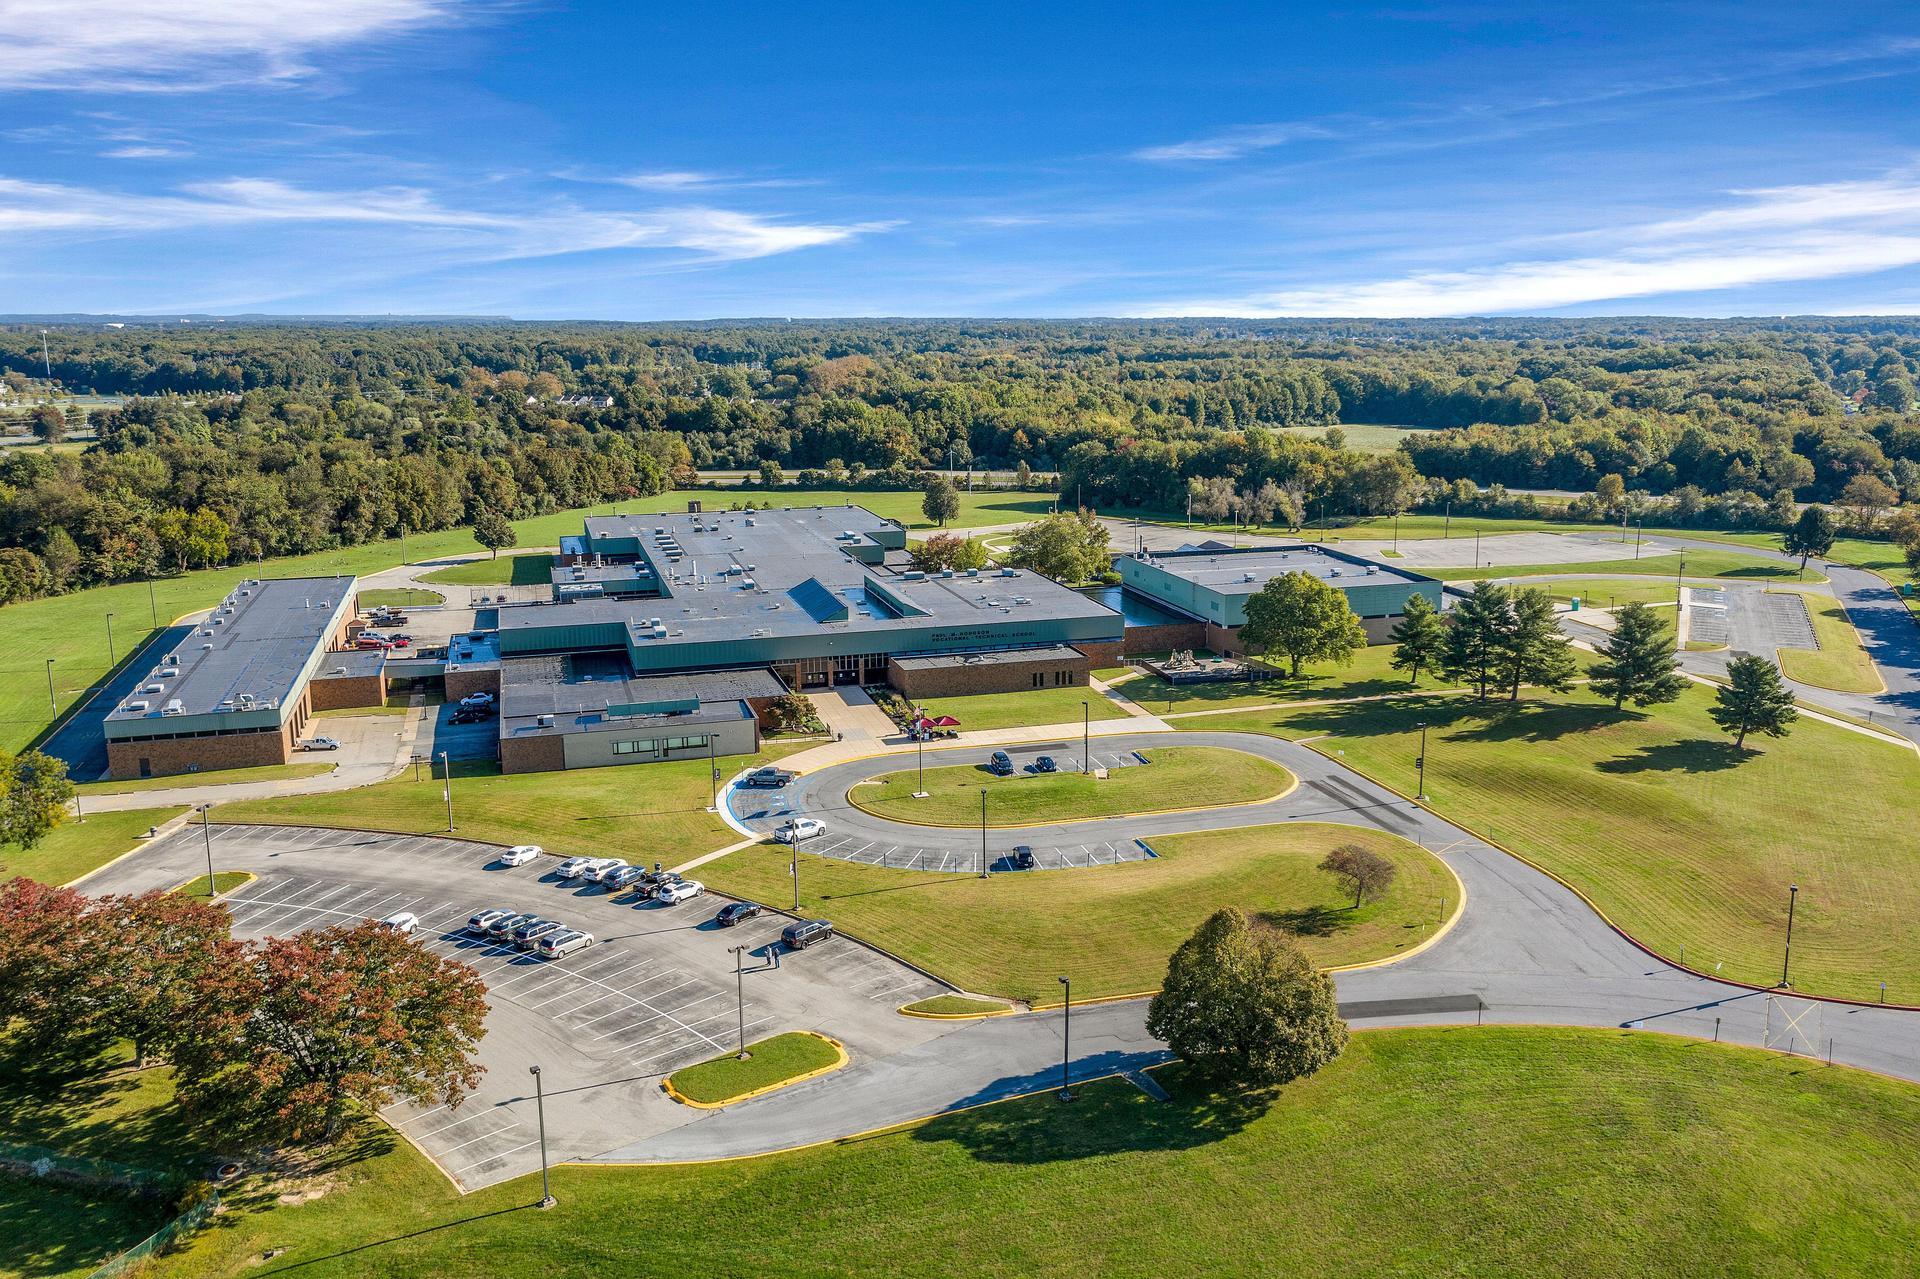 Drone View of Hodgson School